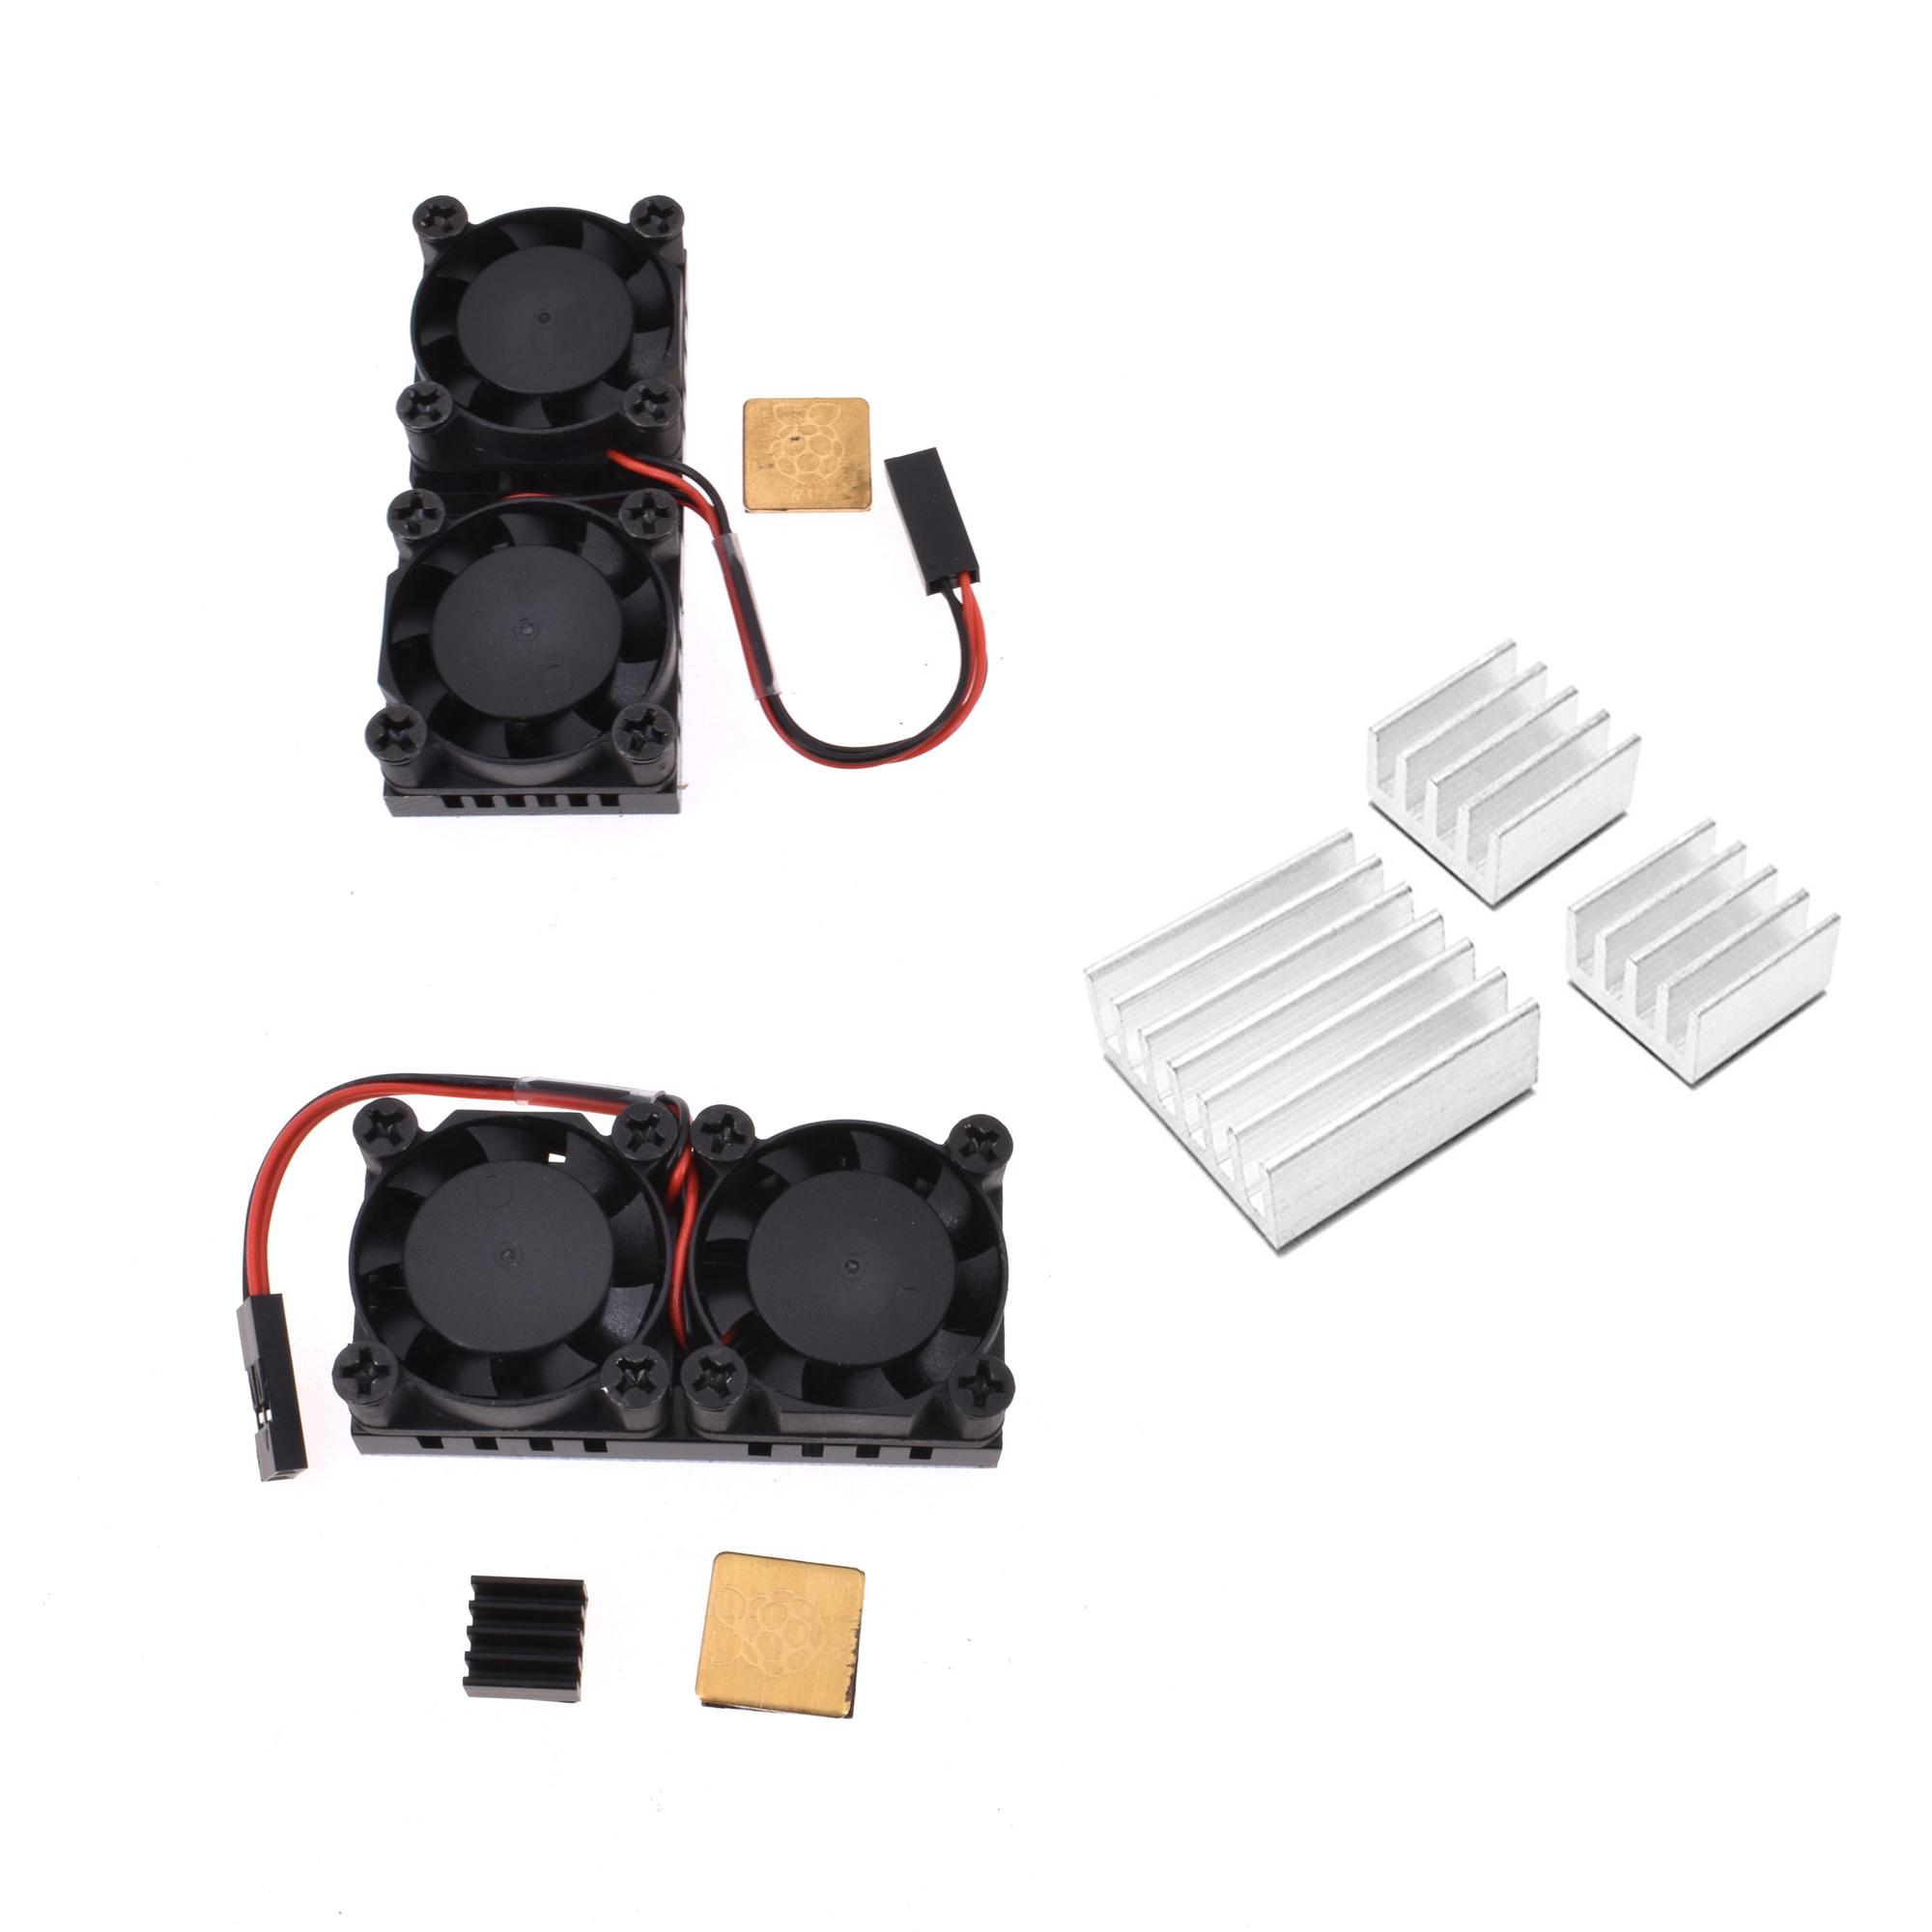 Ultimate Dual Cooling Fan Kit with Aluminum Heatsink For Raspberry Pi 3//2B 3B+